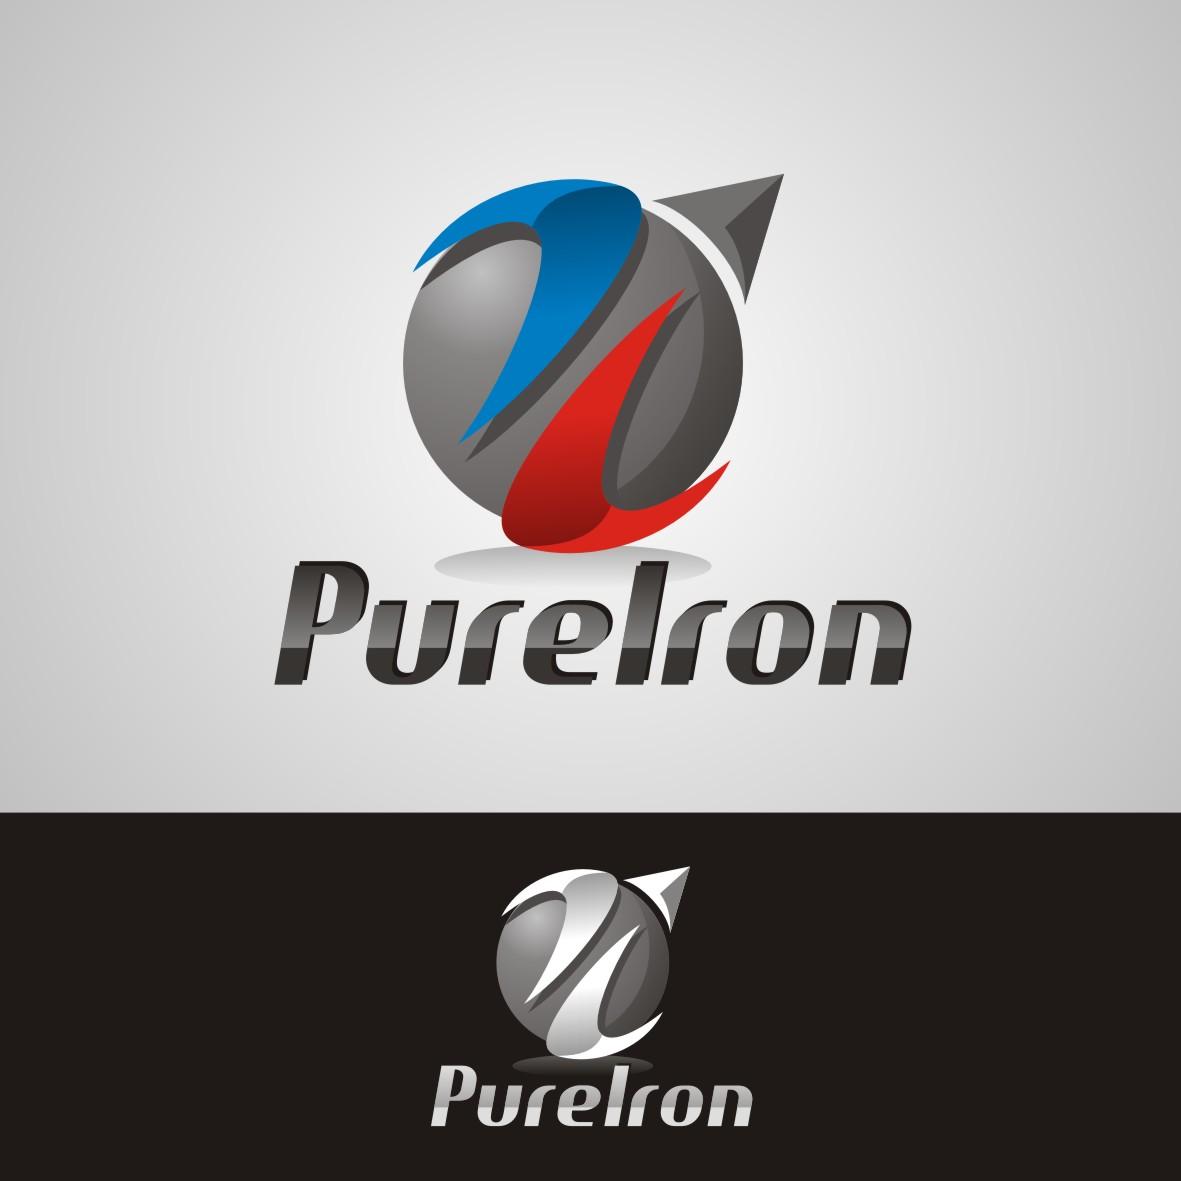 Logo Design by arteo_design - Entry No. 127 in the Logo Design Contest Fun Logo Design for Pure Iron.